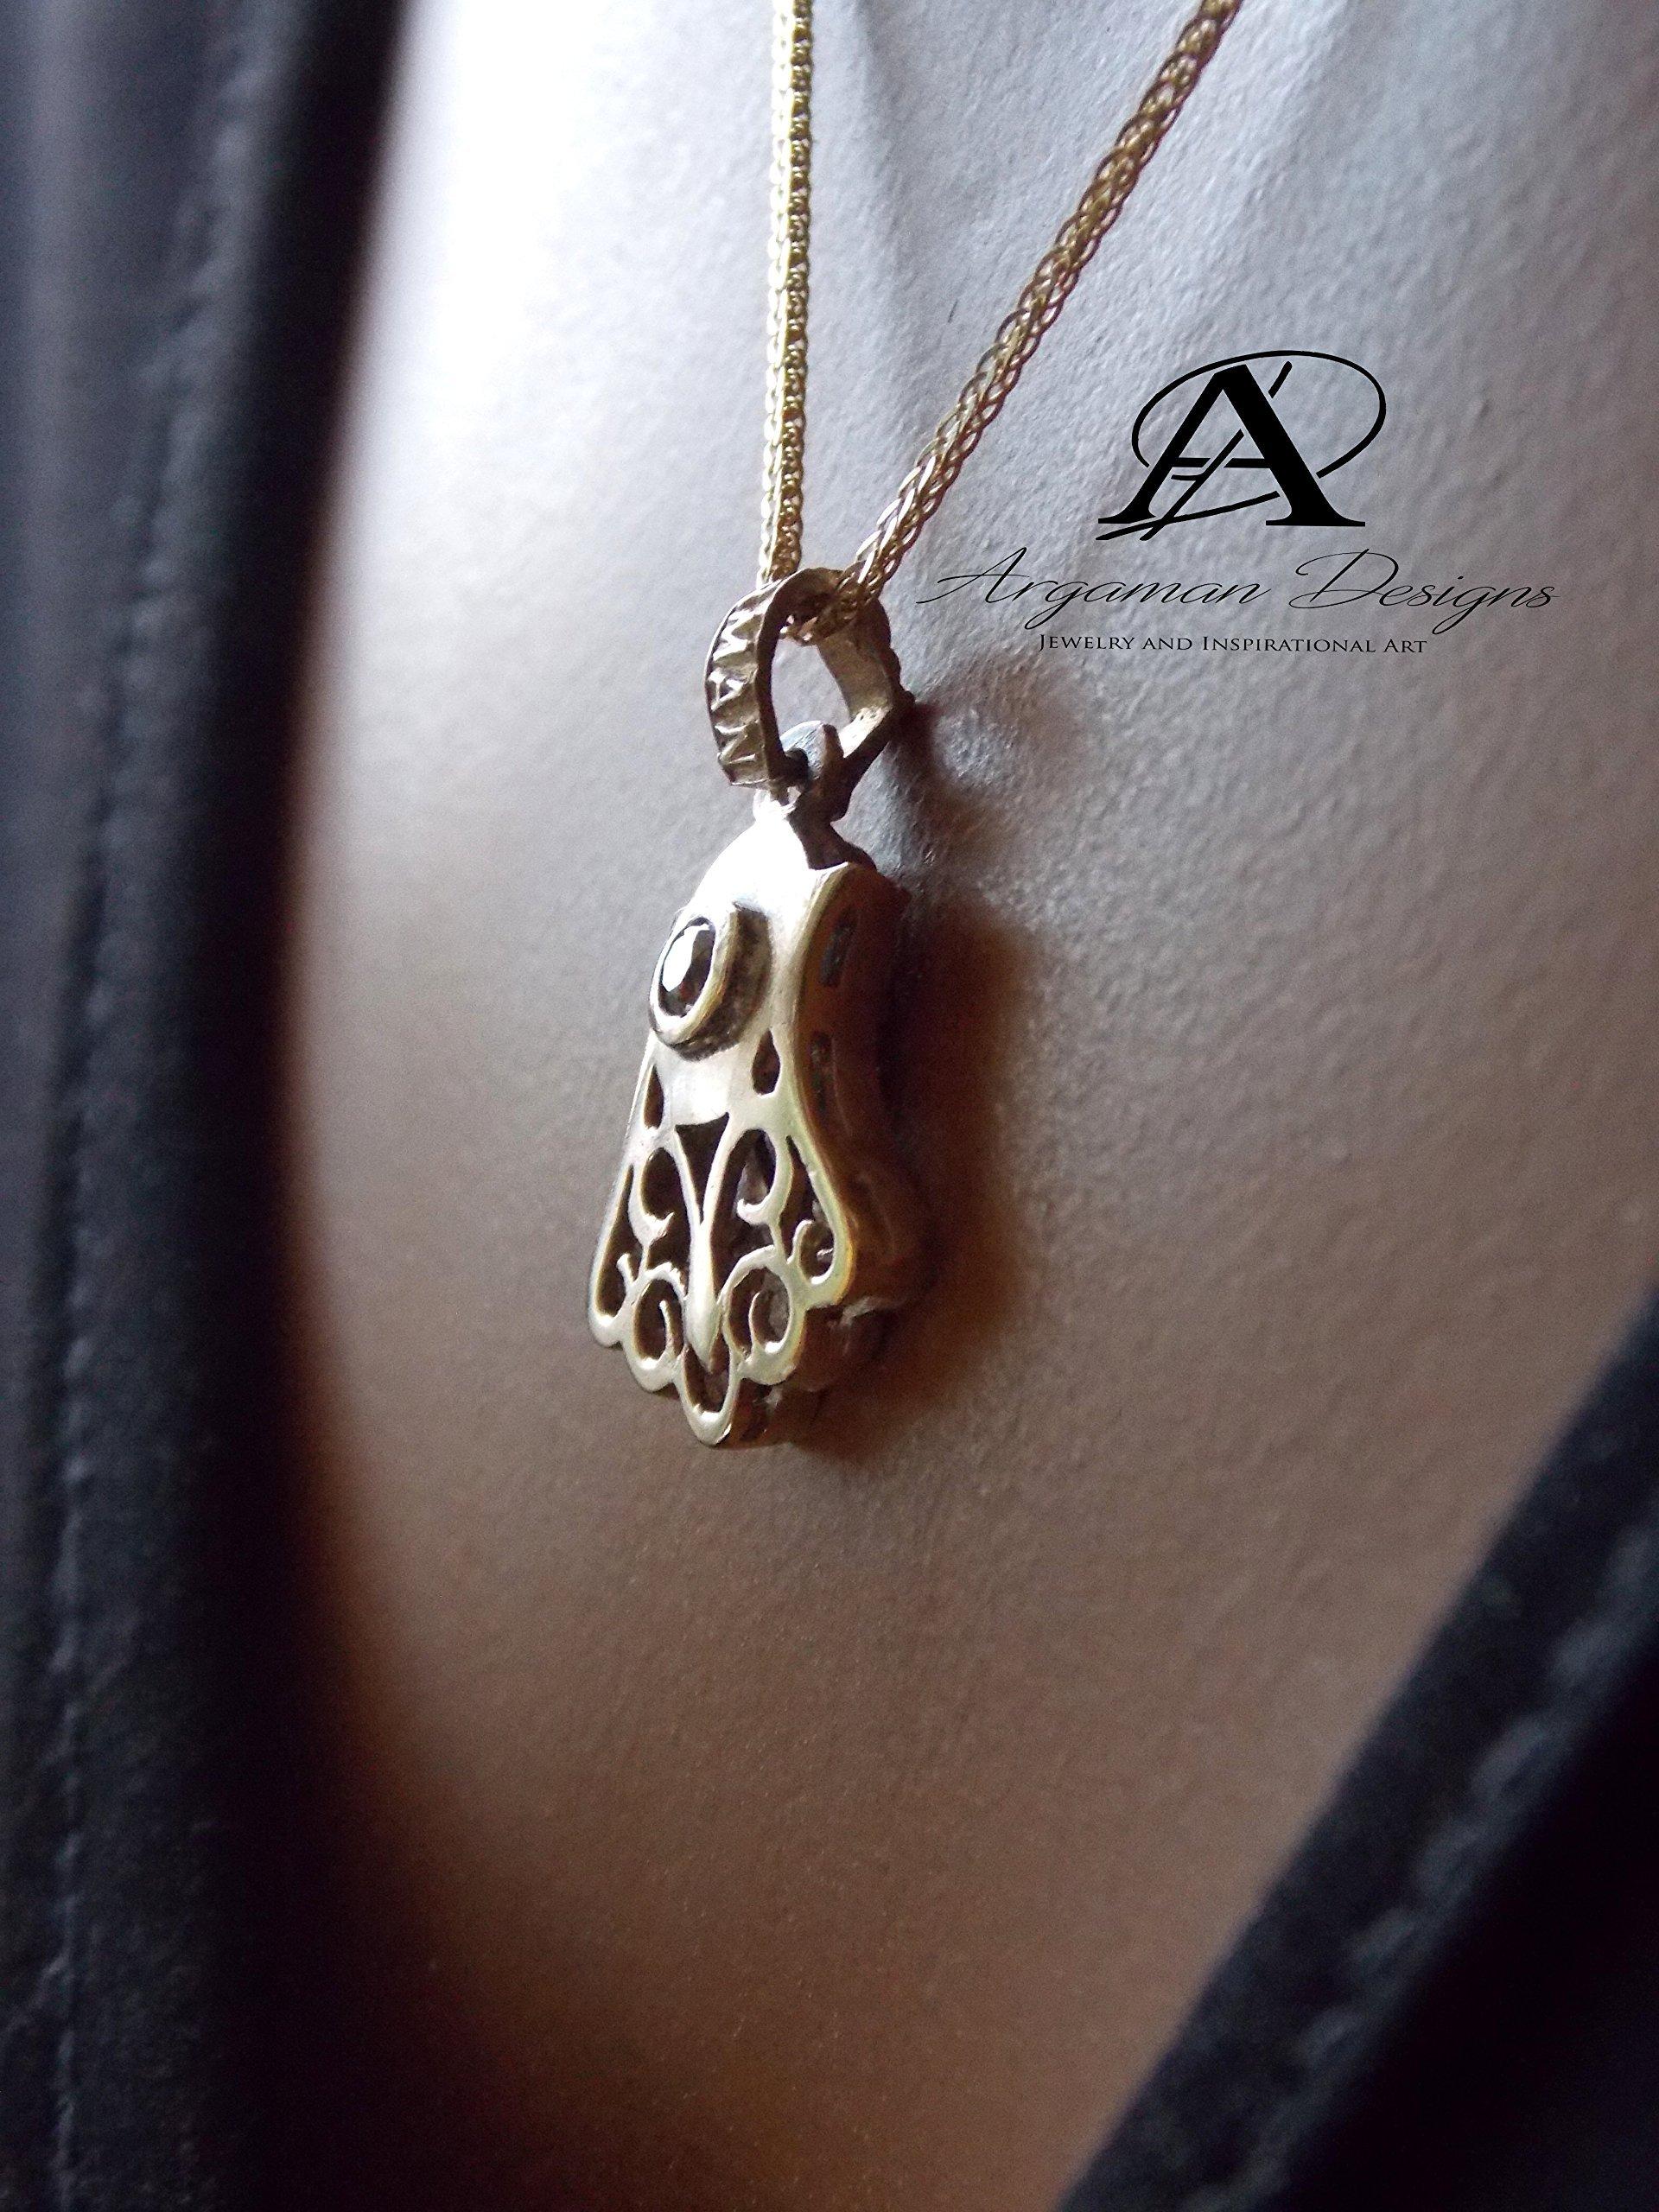 14k Gold Hamsa Pendant, Hand of Fatima, Hand of God, Gold Talisman, Kabbalah Necklace, Evil Eye Protection Necklace,